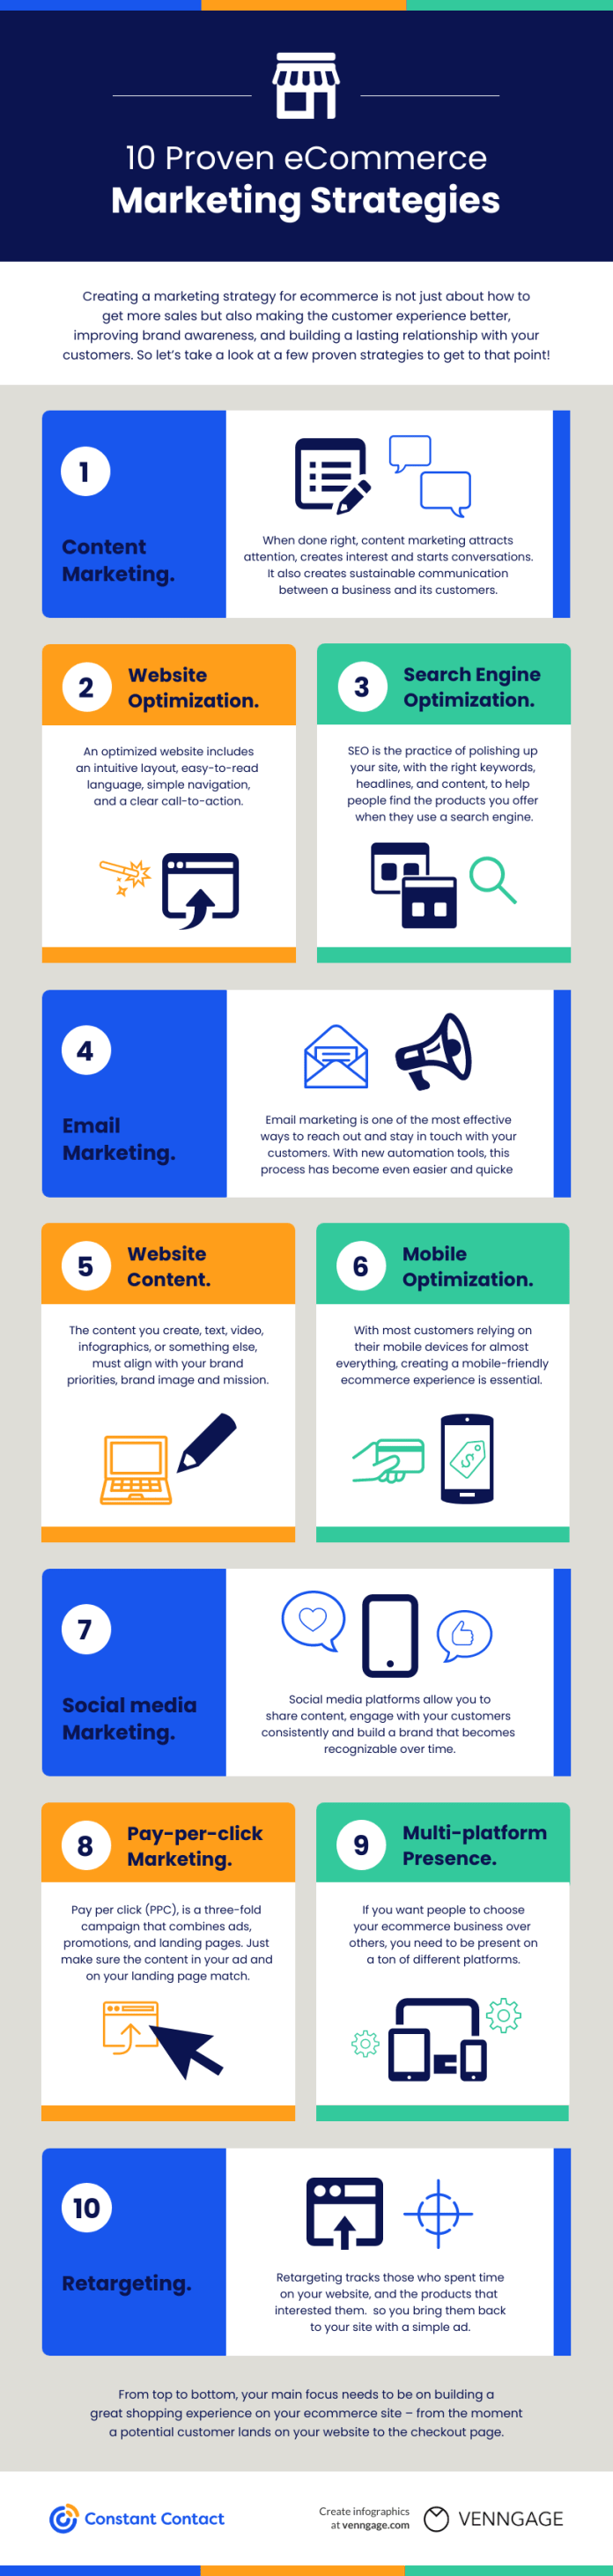 10 proven ecommerce strategies